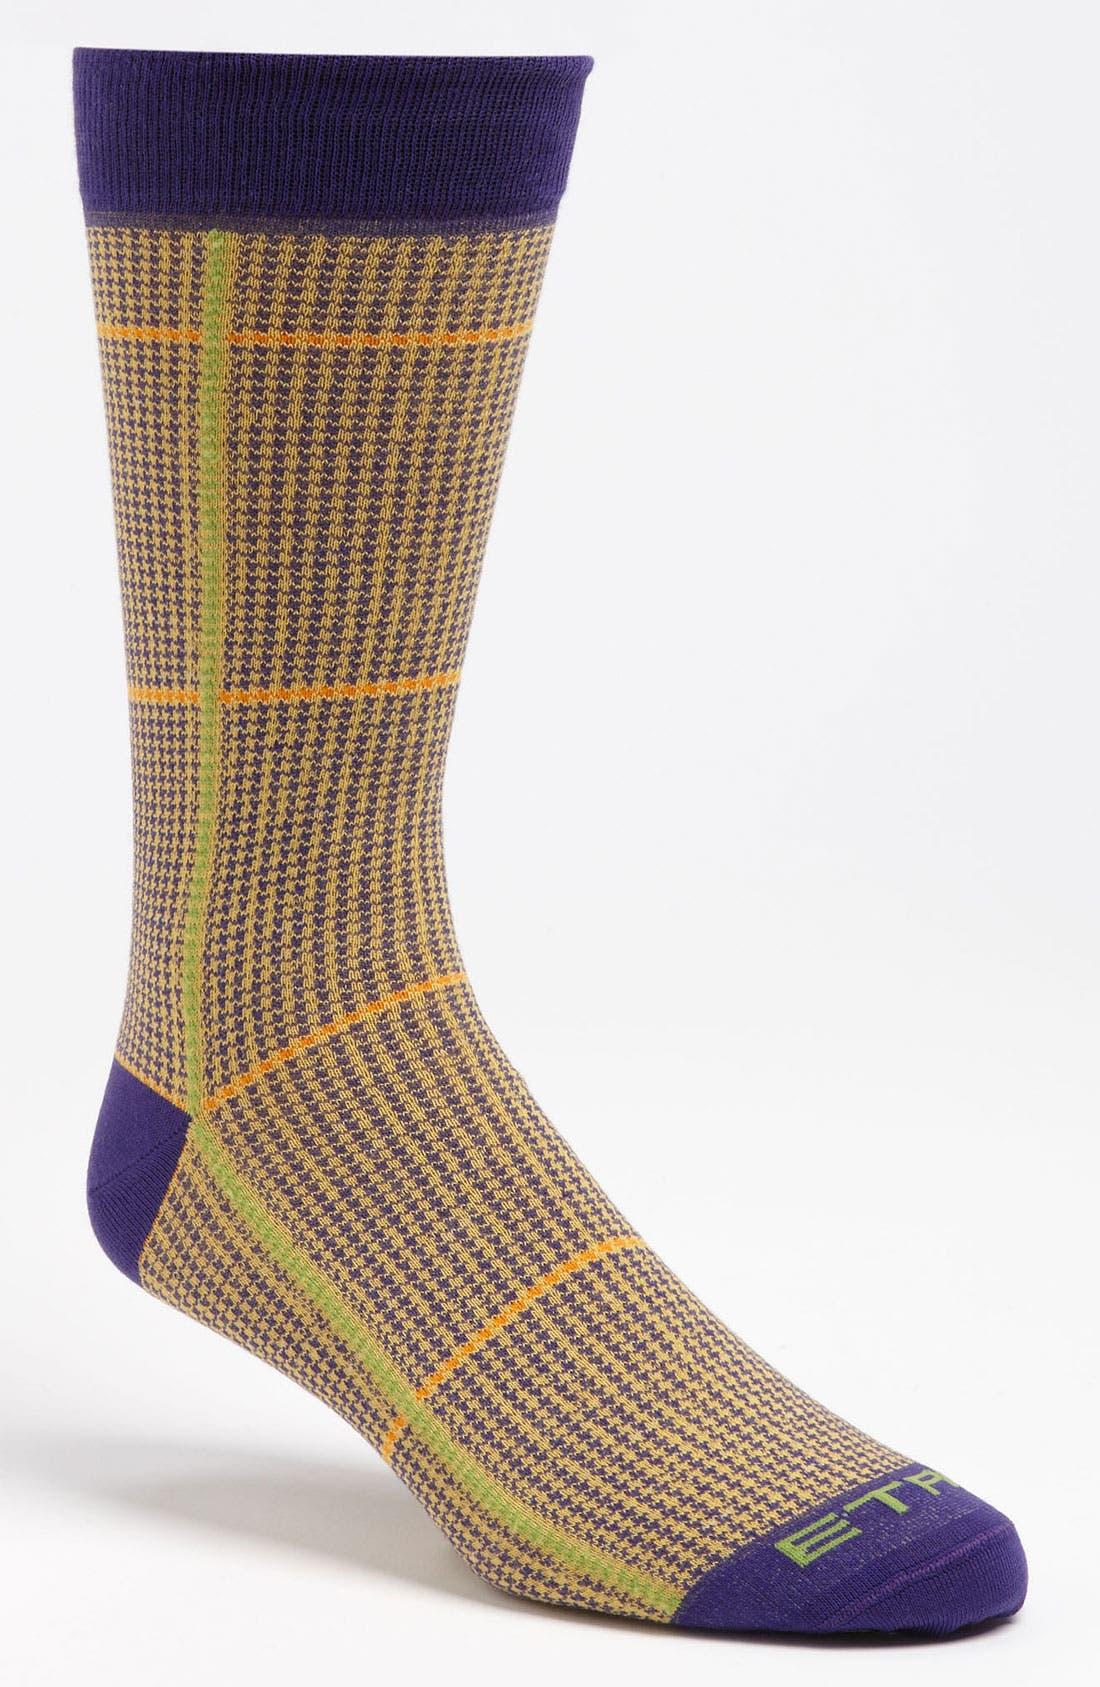 Main Image - Etro Houndstooth Cotton Blend Socks